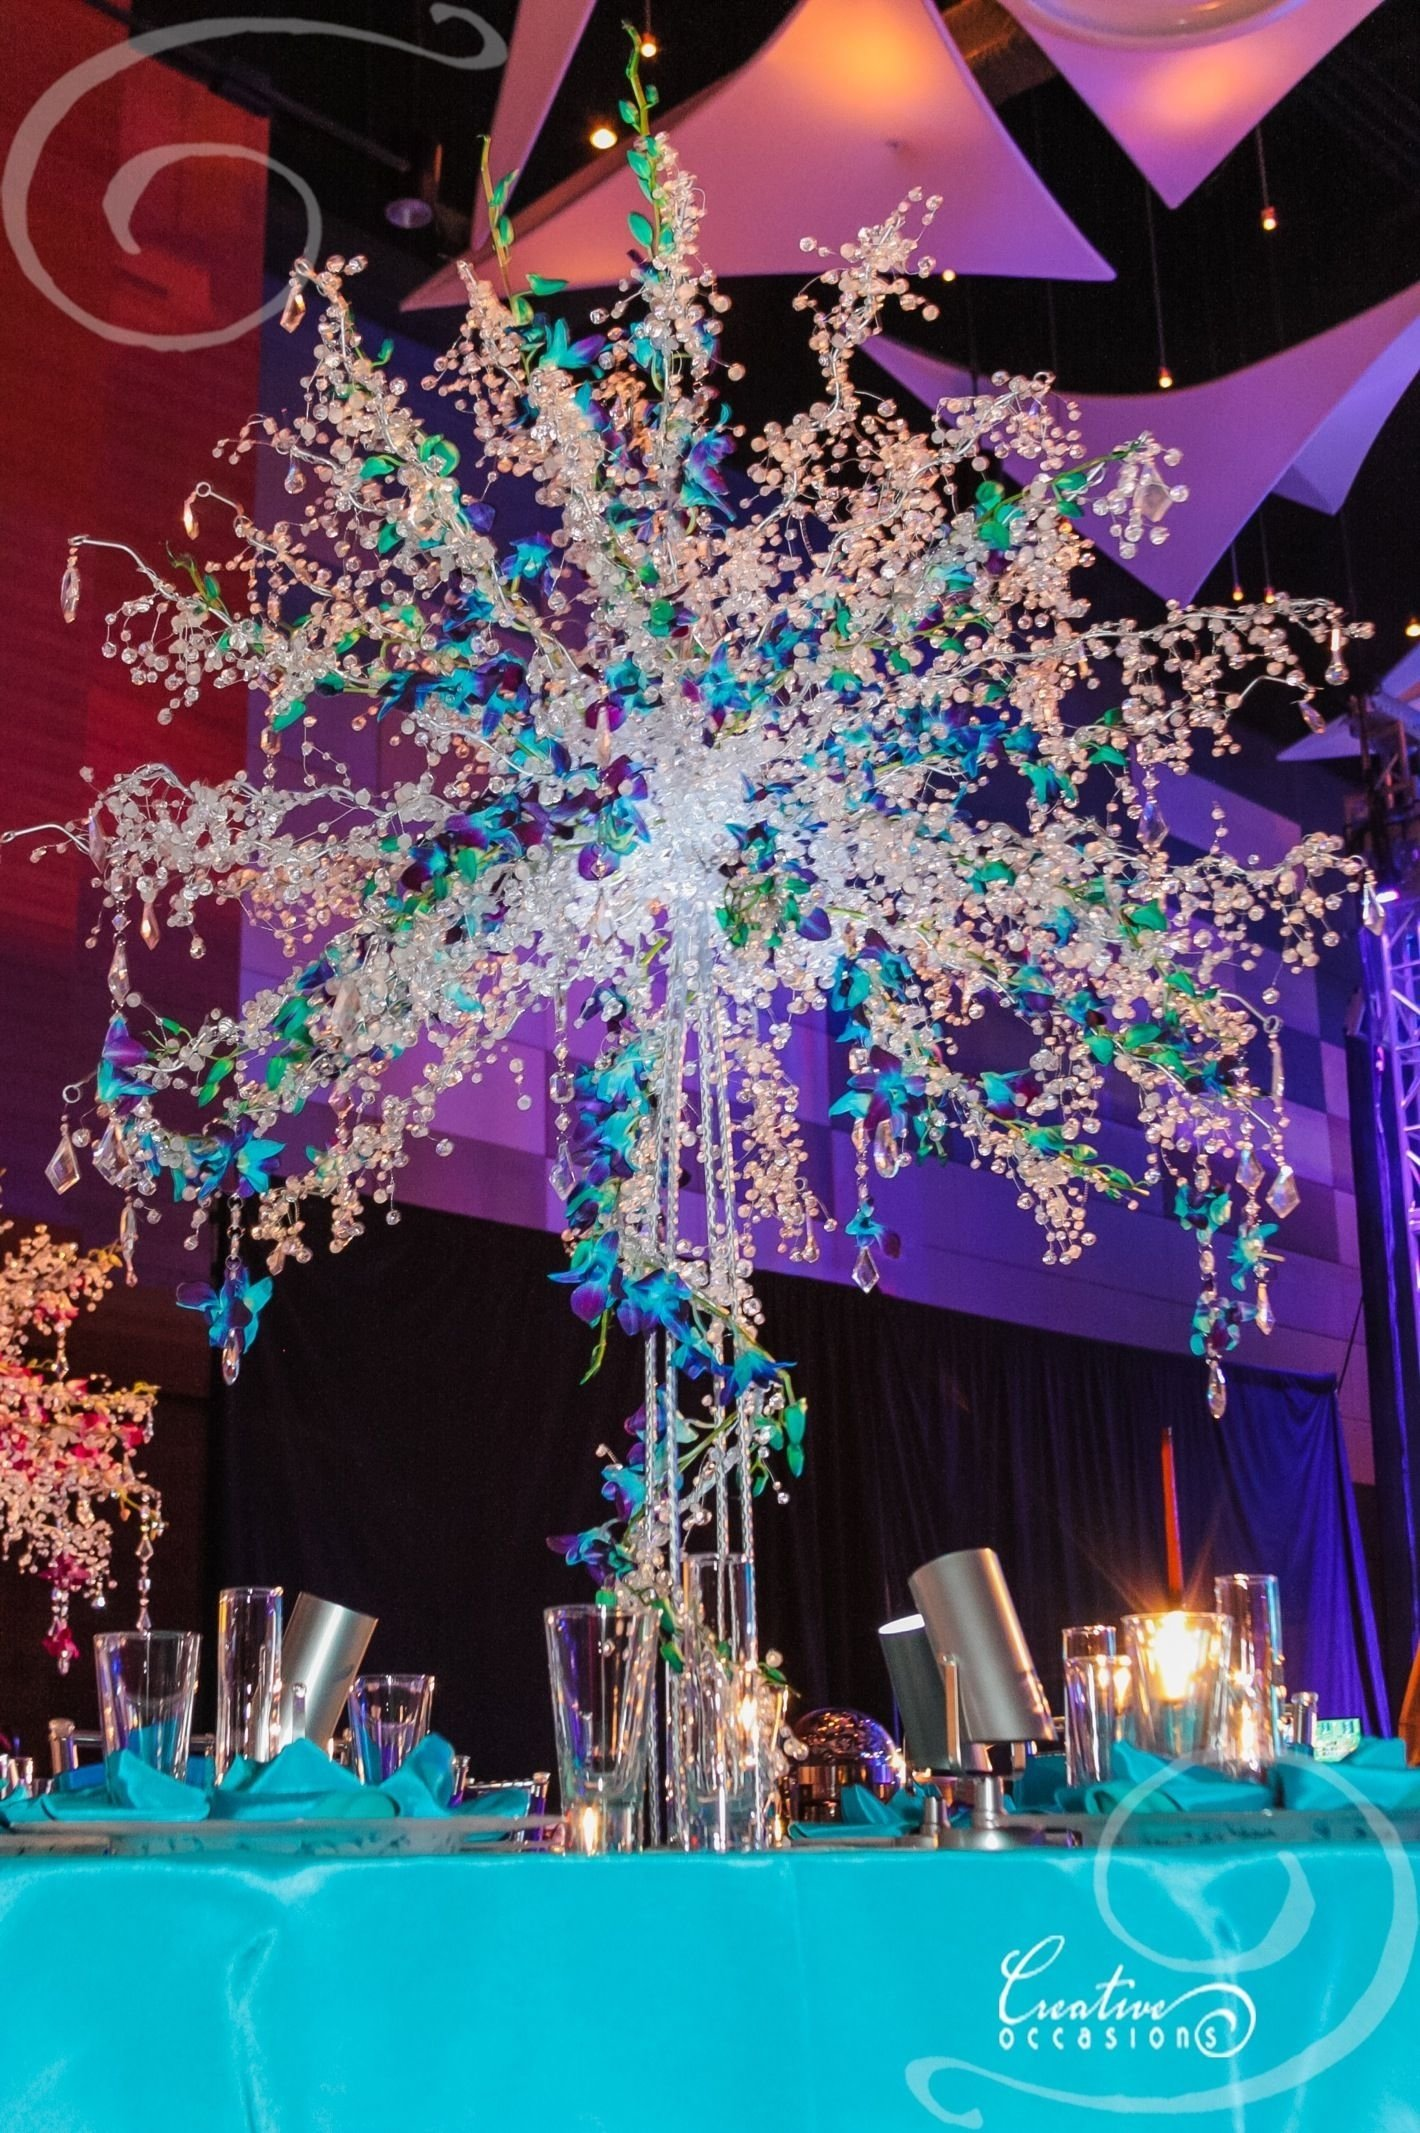 10 Fabulous Winter Wonderland Sweet 16 Ideas winter wonderland sweet 16 dresses funny quotes contact dmca 2020